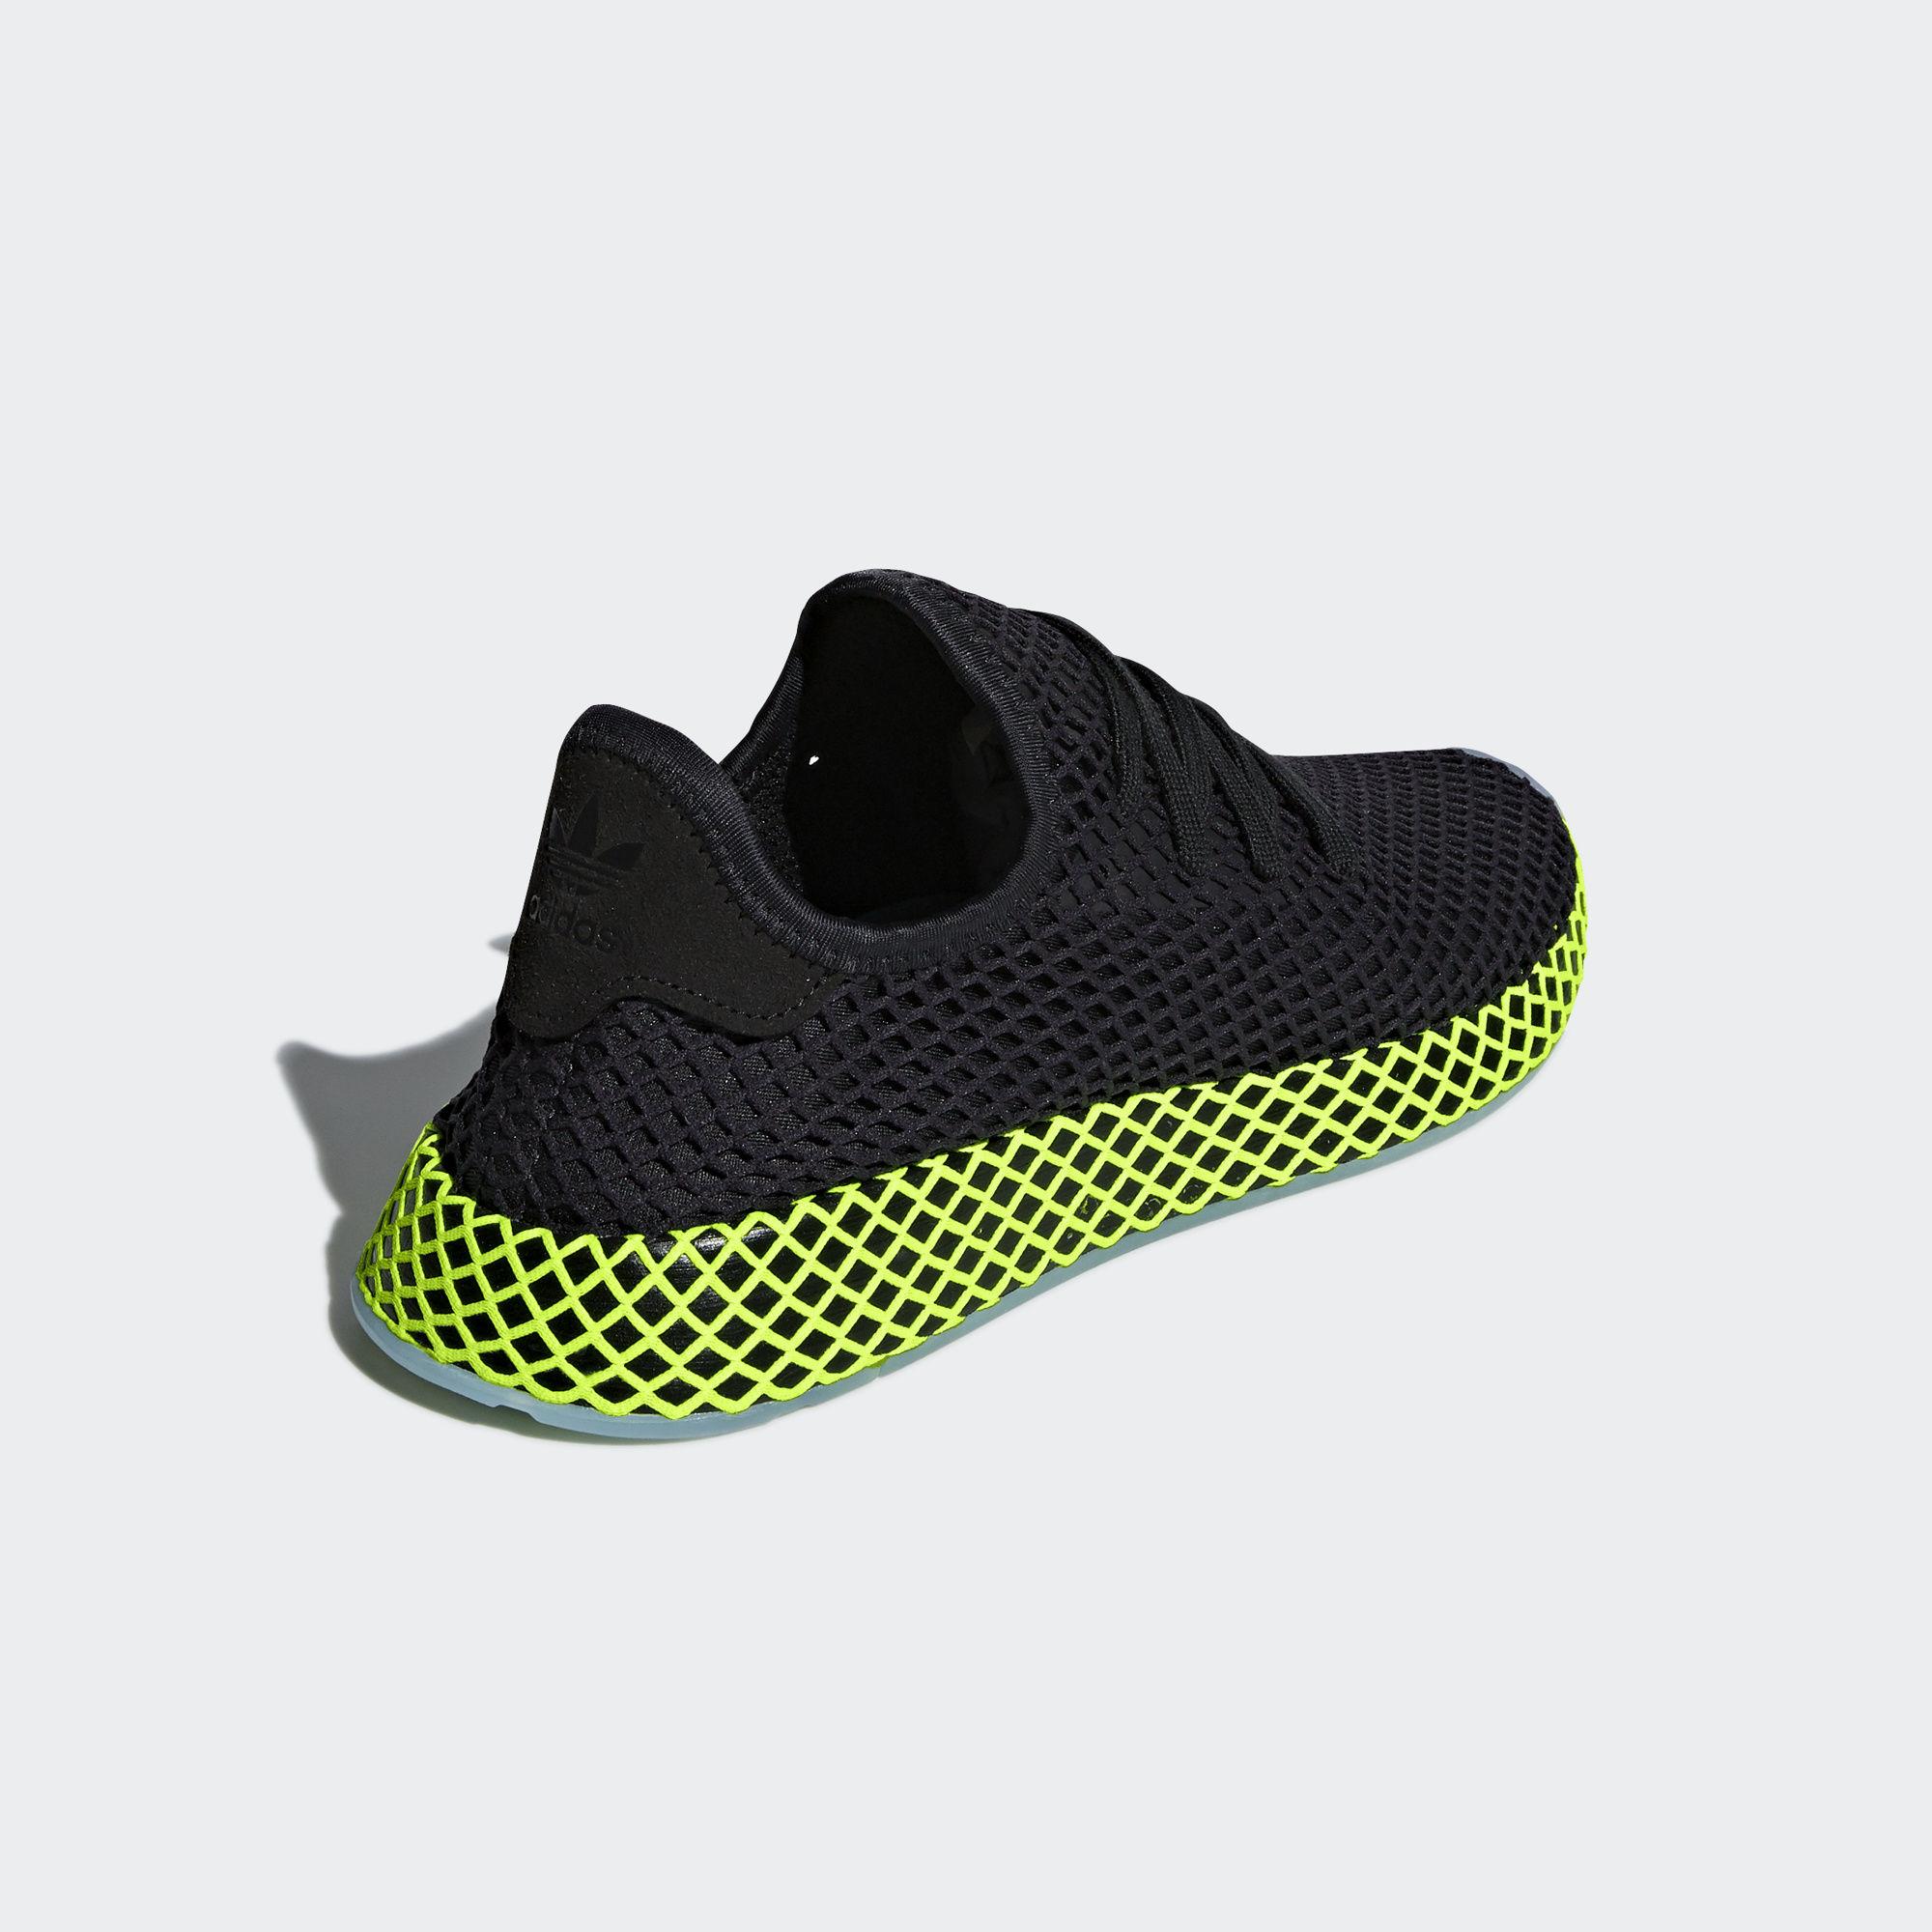 Adidas Deerupt Runner Core Black / Core Black / Ash Blue (B41755)